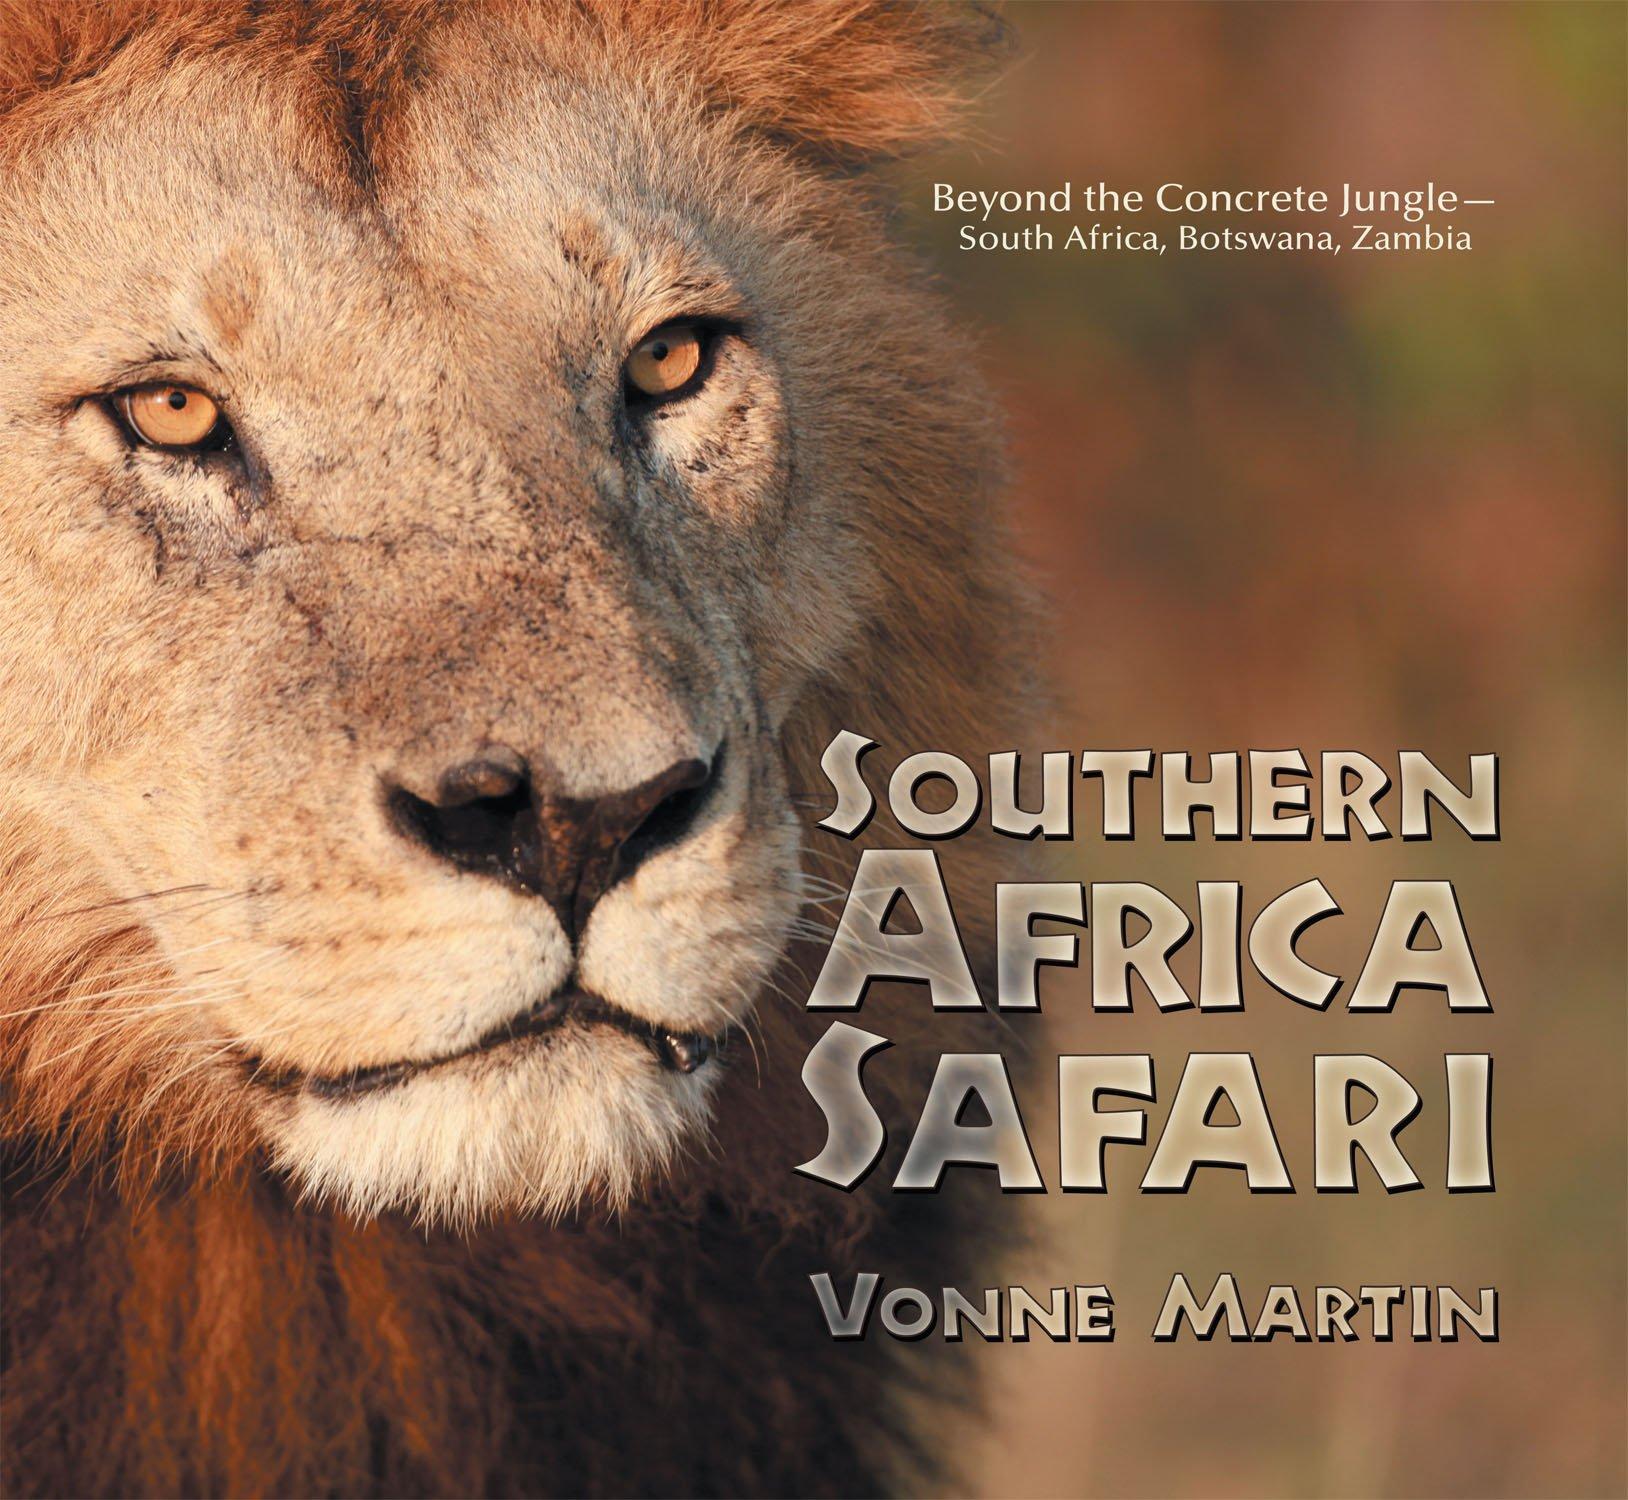 Download Southern Africa Safari:Beyond the Concrete Jungle South Africa, Botswana, Zambia PDF